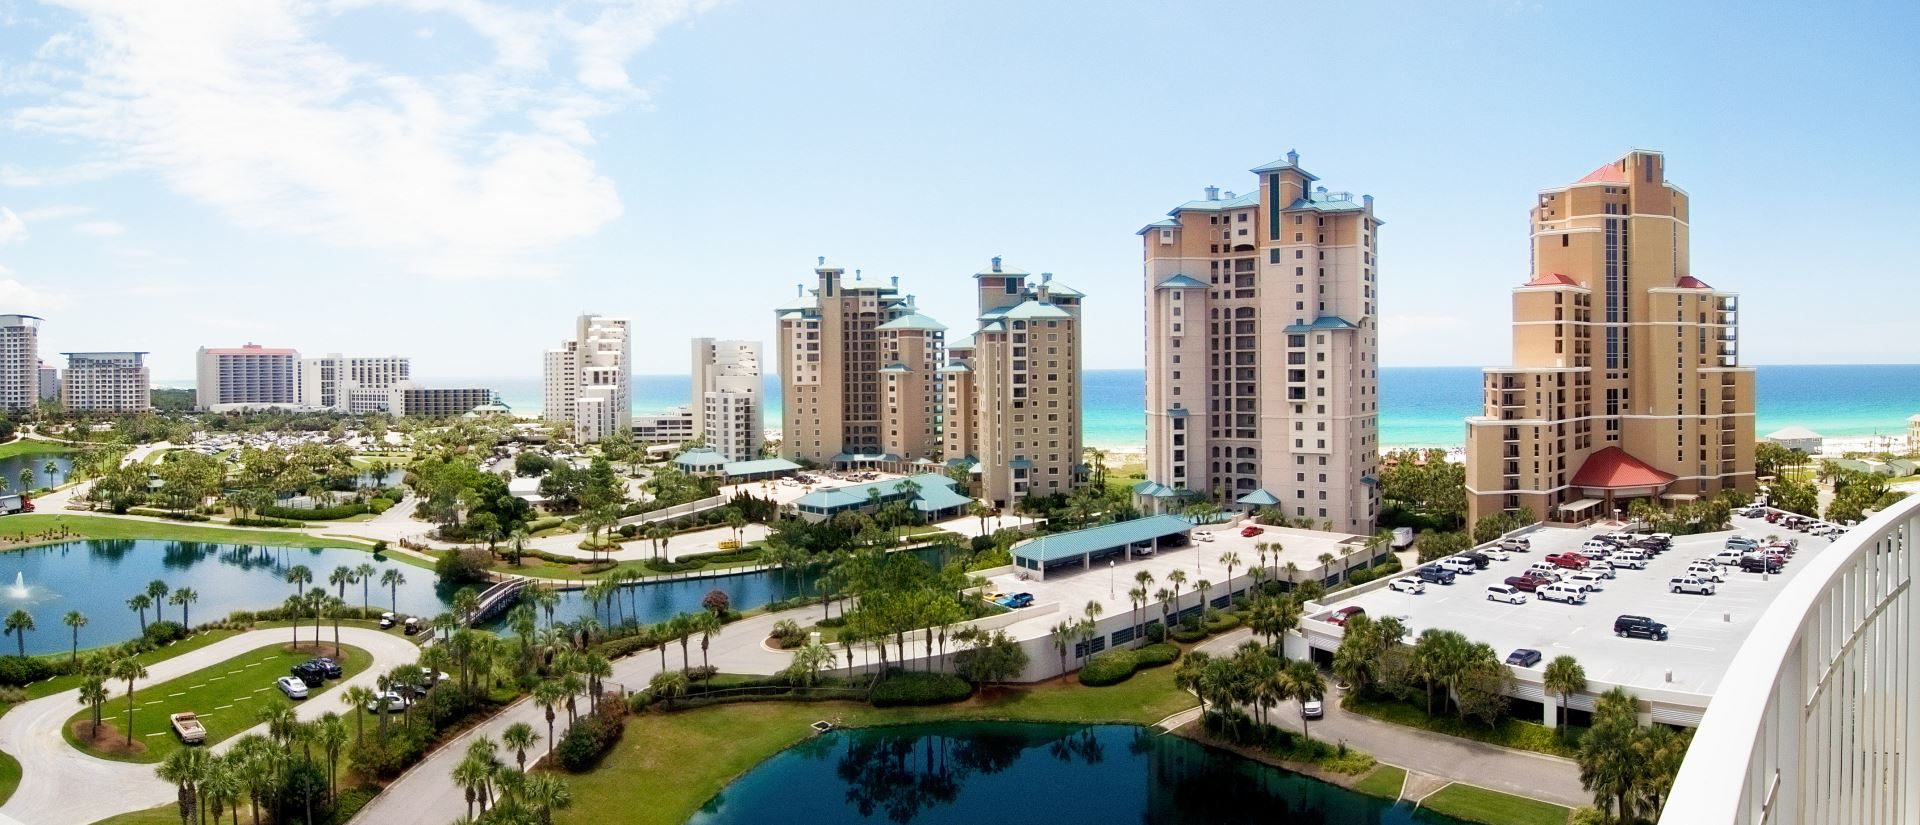 Sandestin Resort